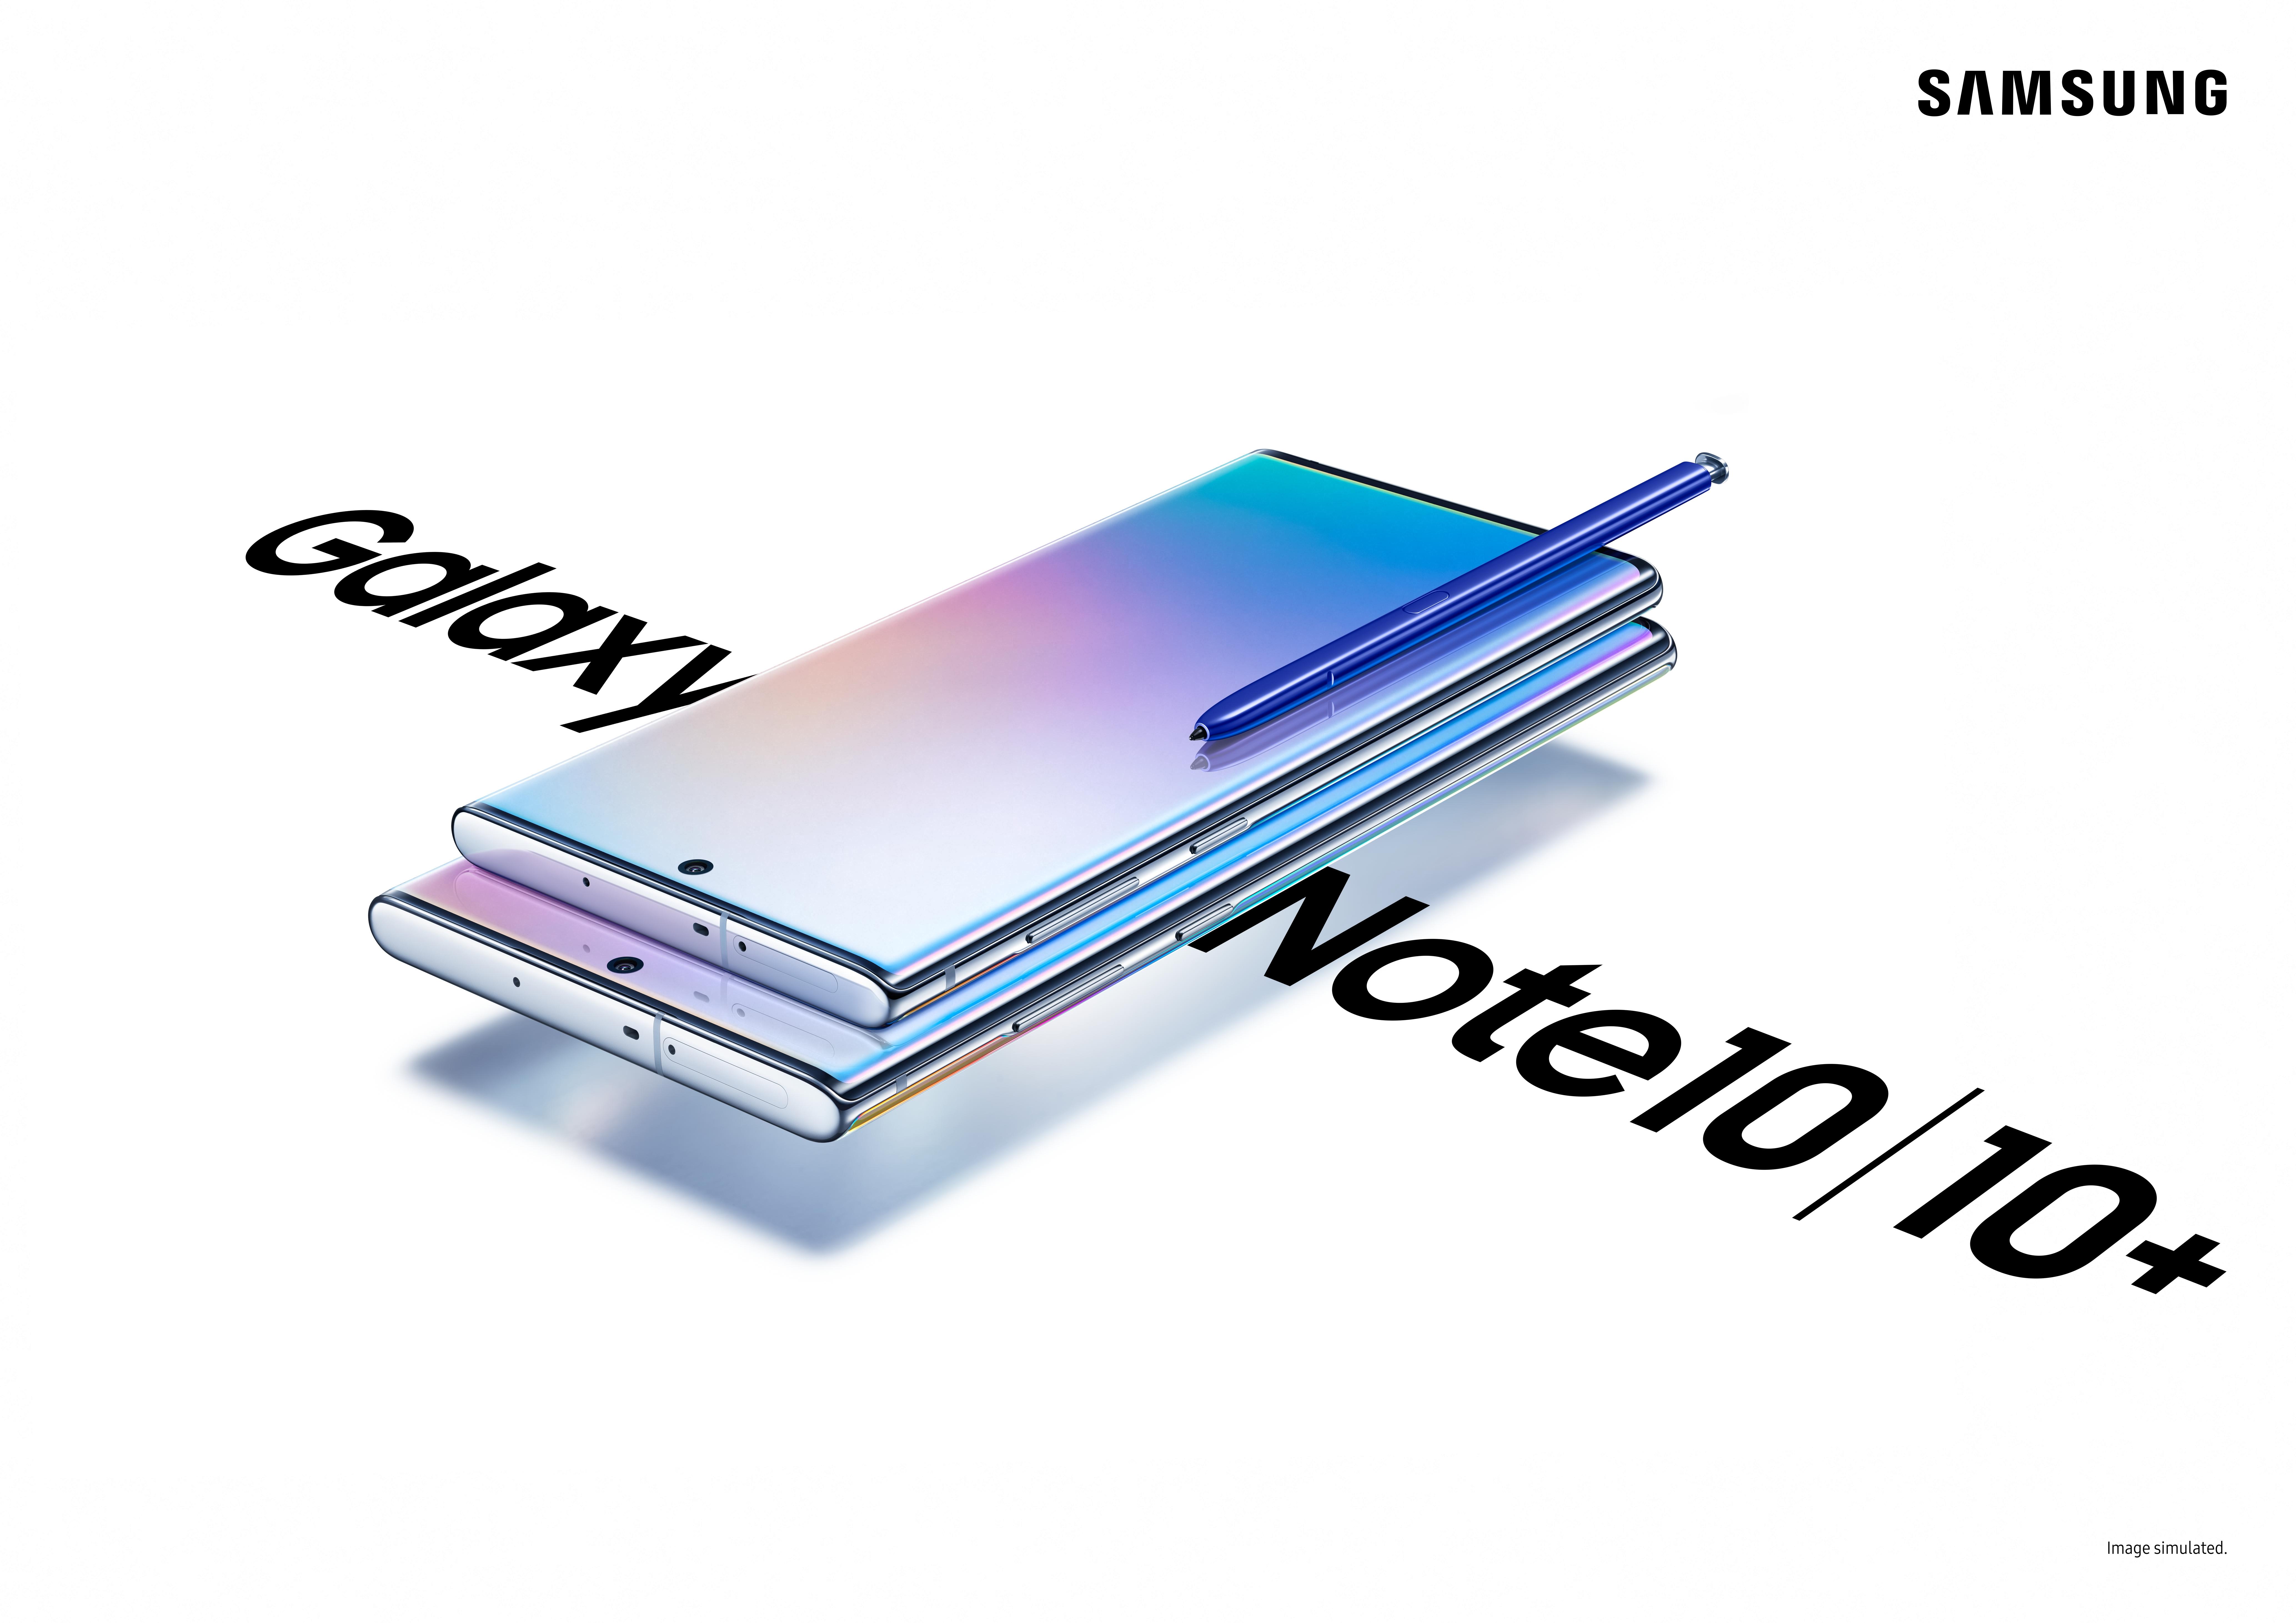 Galaxy Note10 | Galaxy Note10+